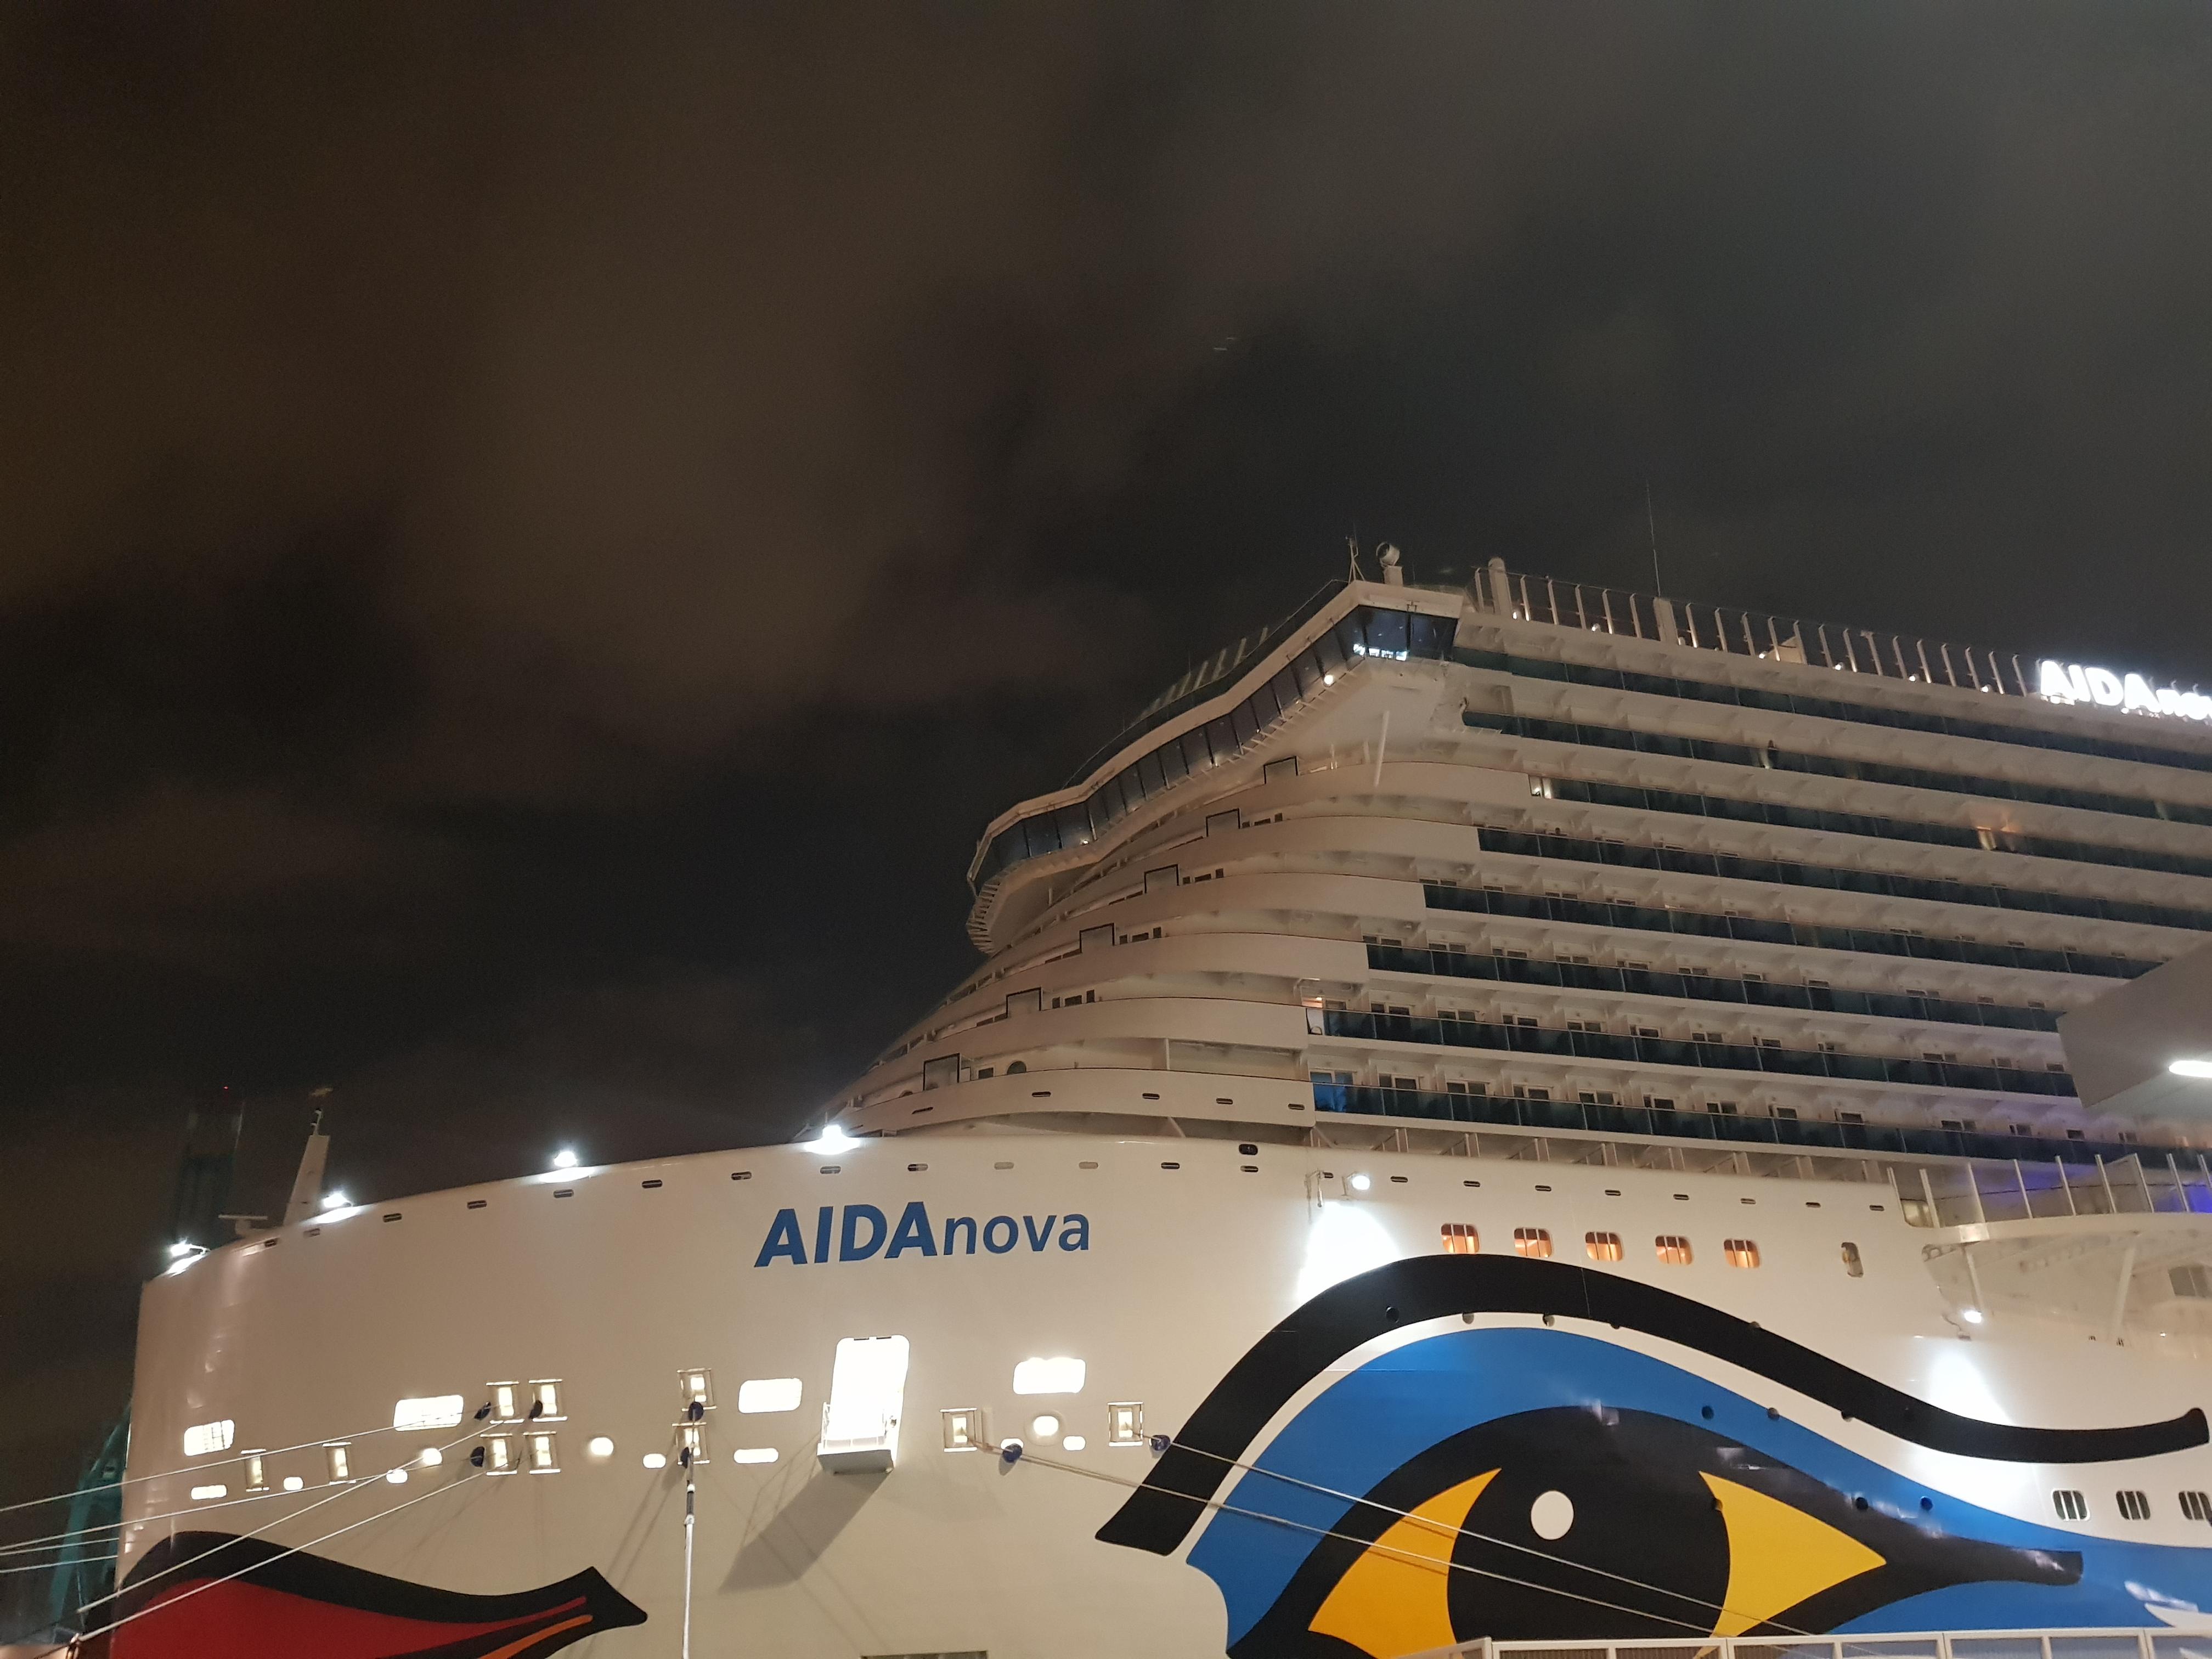 AIDAnova